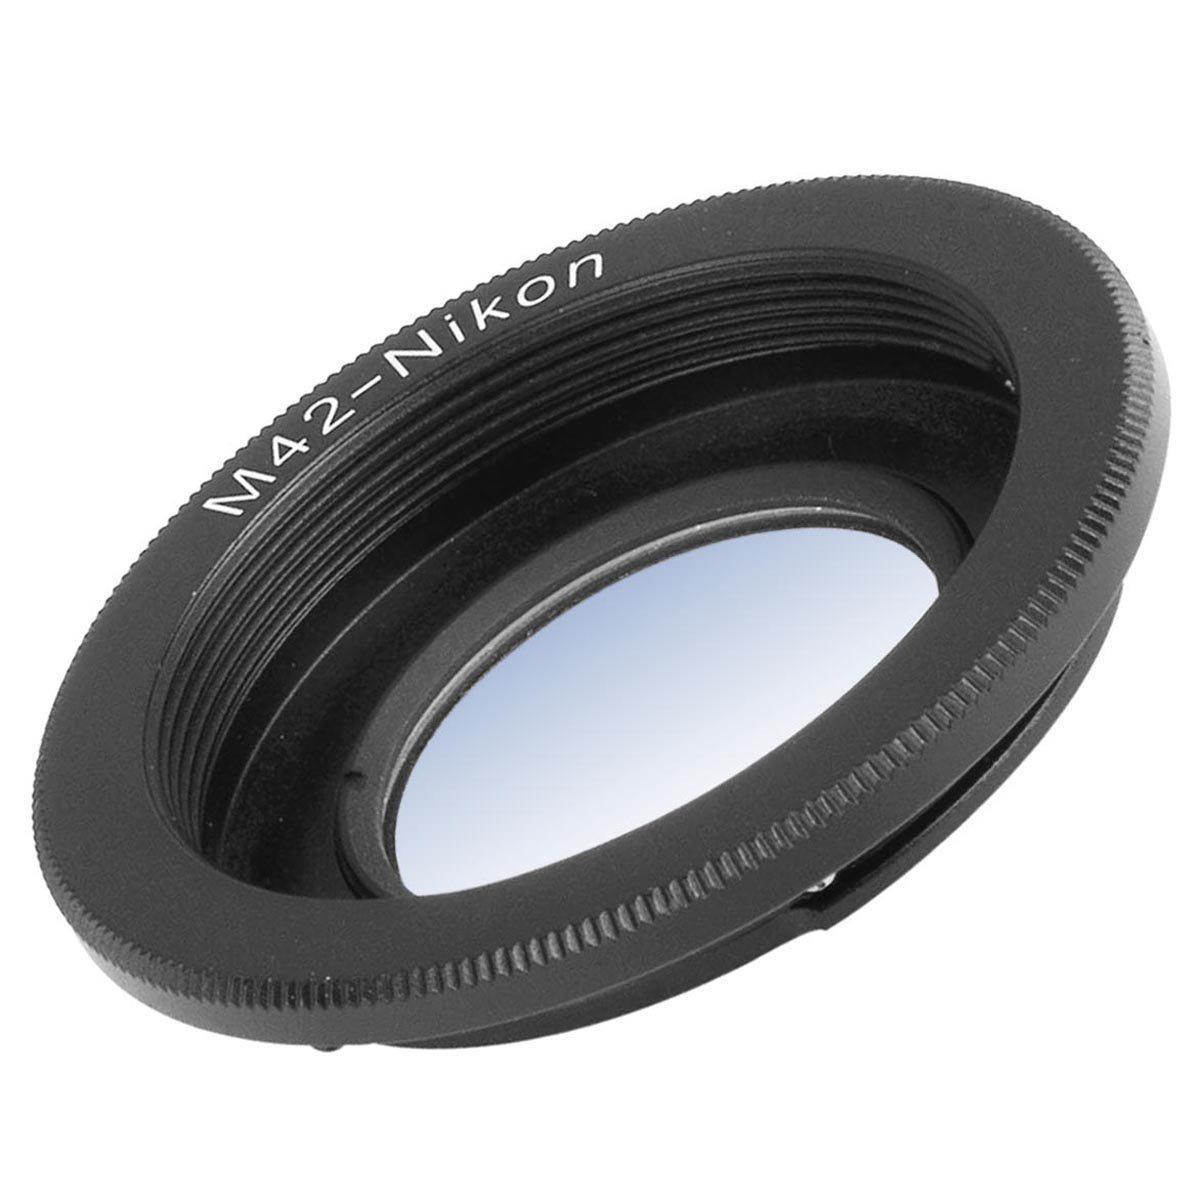 Адаптер-переходник M42-Nikon (с линзой).